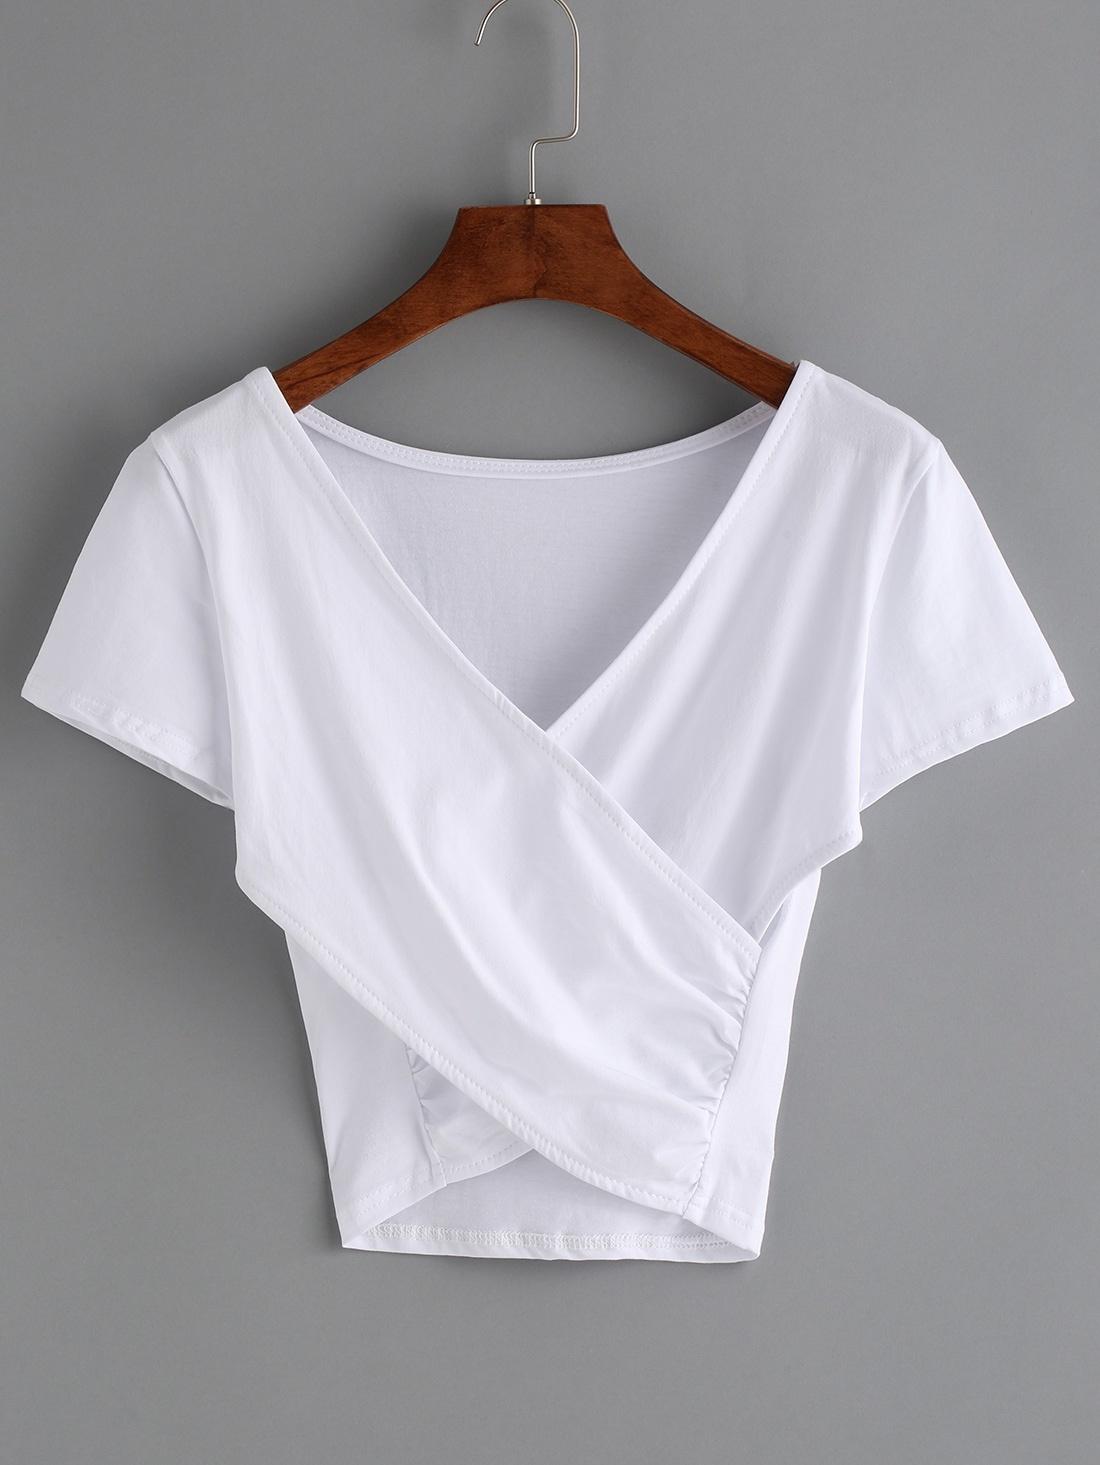 Plain T Shirts Women S